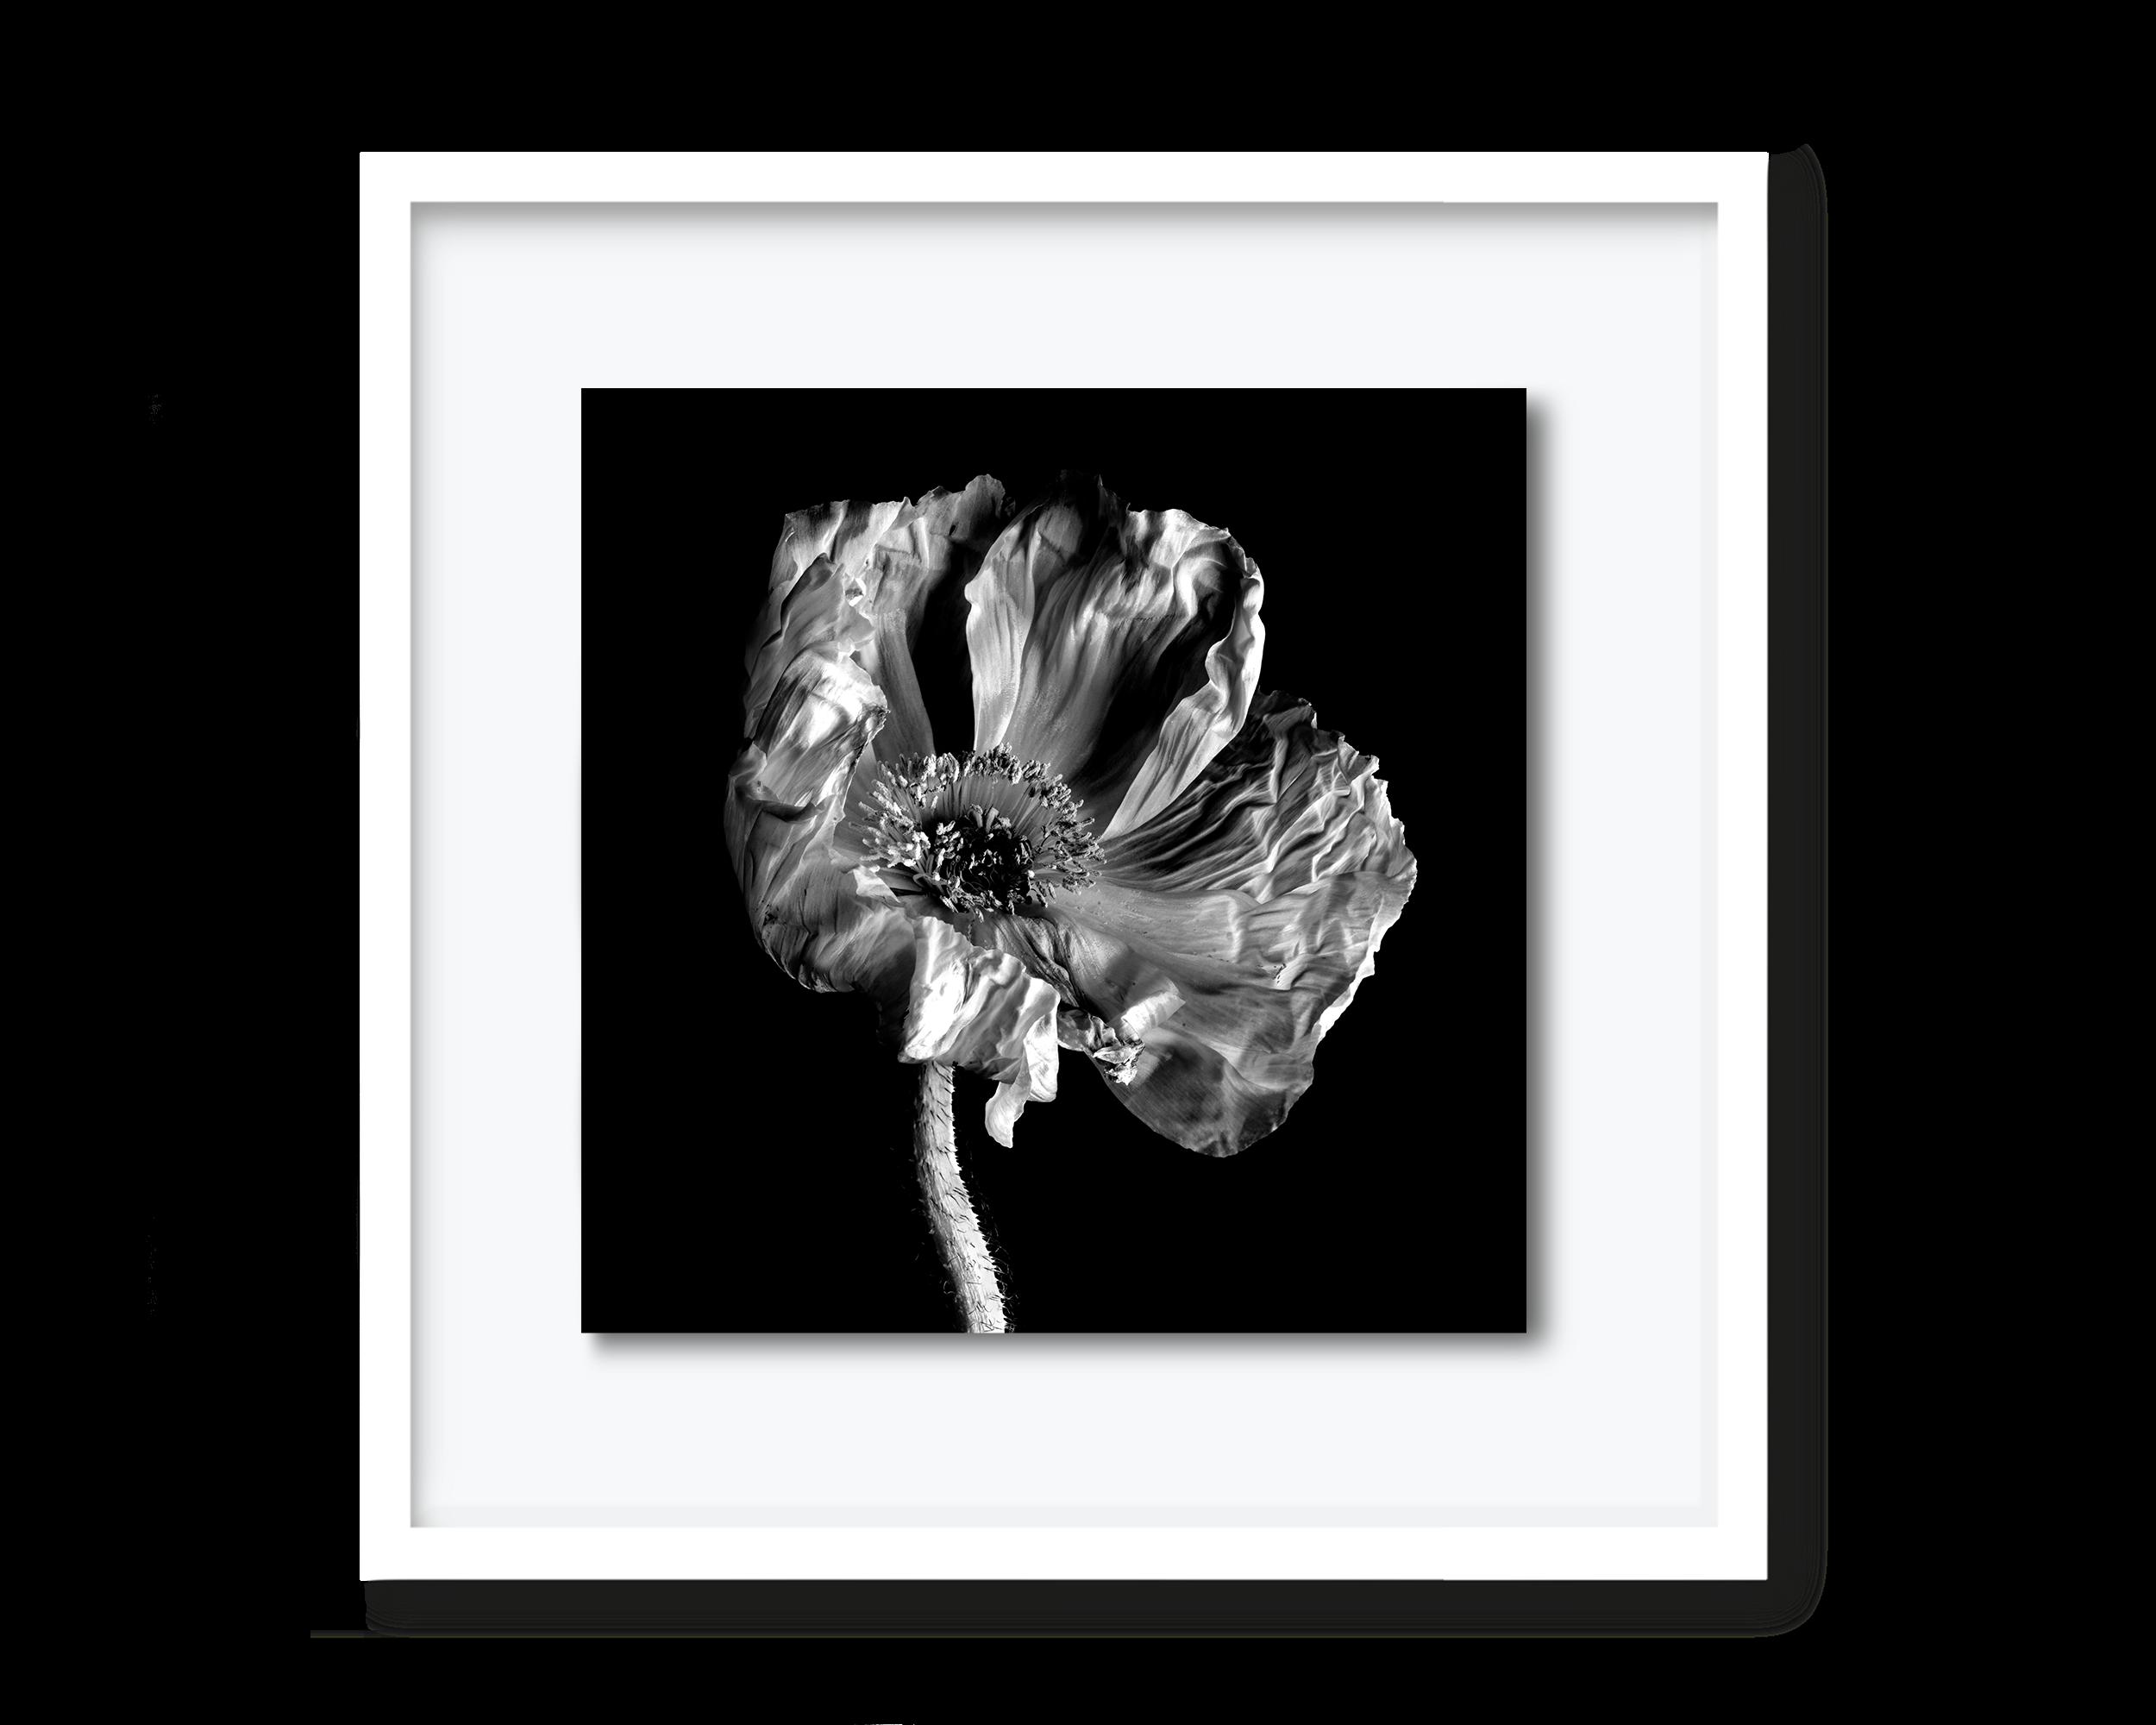 58.david-pearce-poppy.png